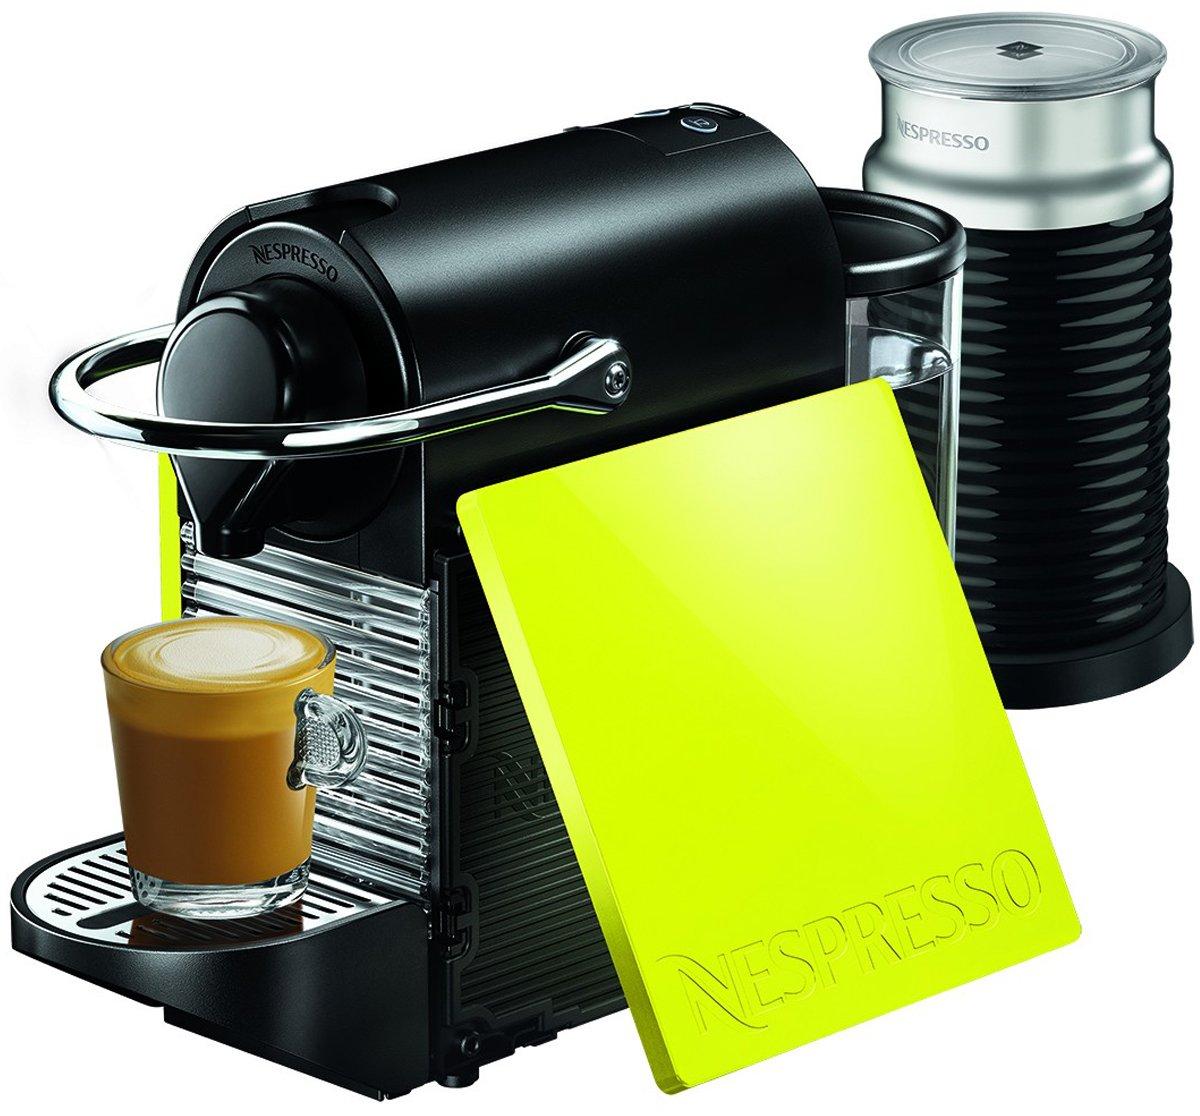 New Breville Bec450xb Nespresso Pixi Clips Bundle Coffee